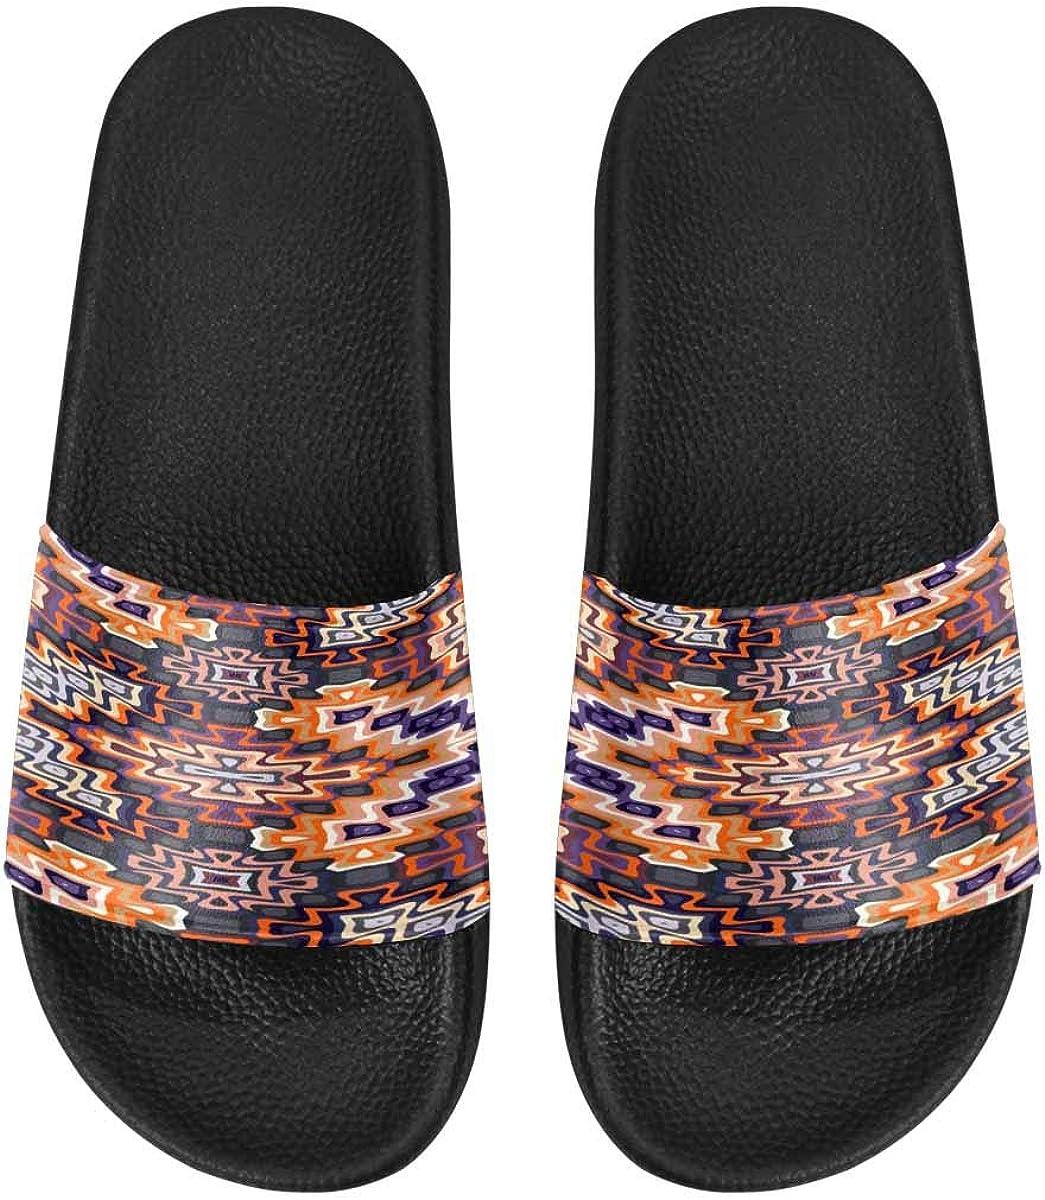 InterestPrint Outdoor Stylish Sandals Slides for Women Art Tribal Pattern